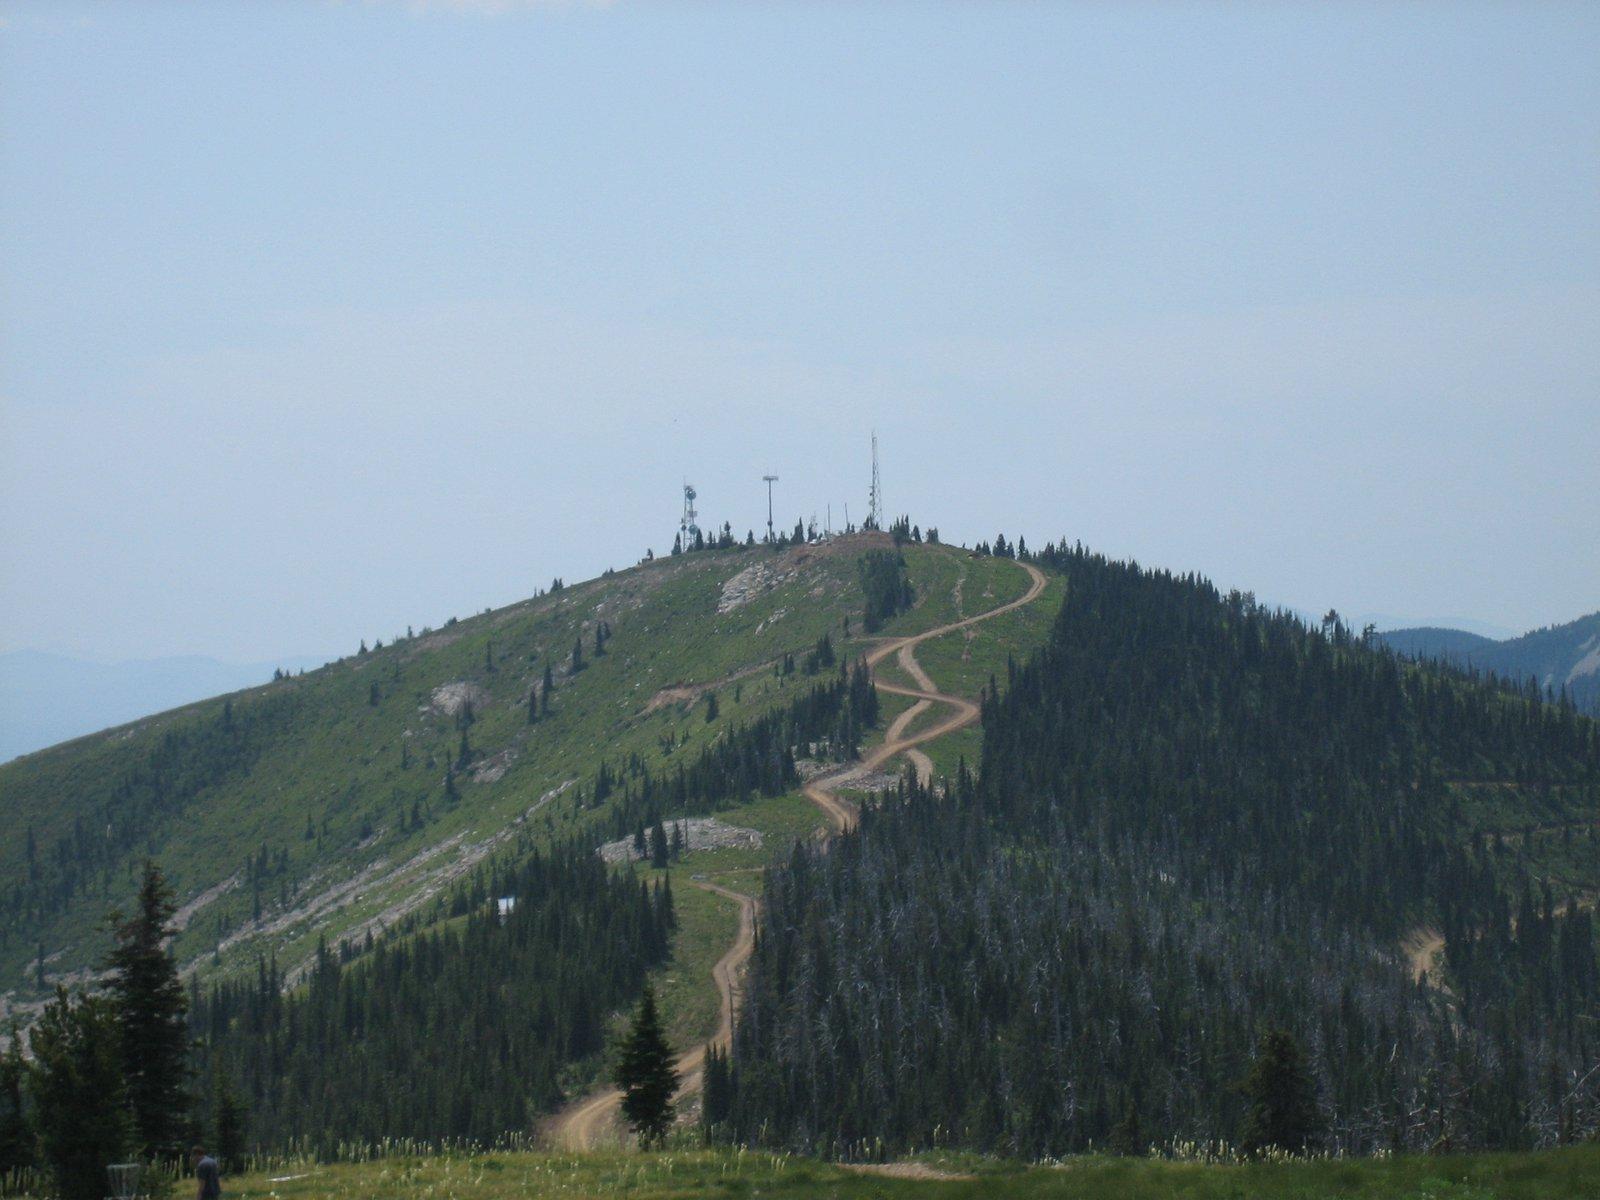 Construction at Schweitzer Mountain Resort, Summer 2007 - 7 of 8